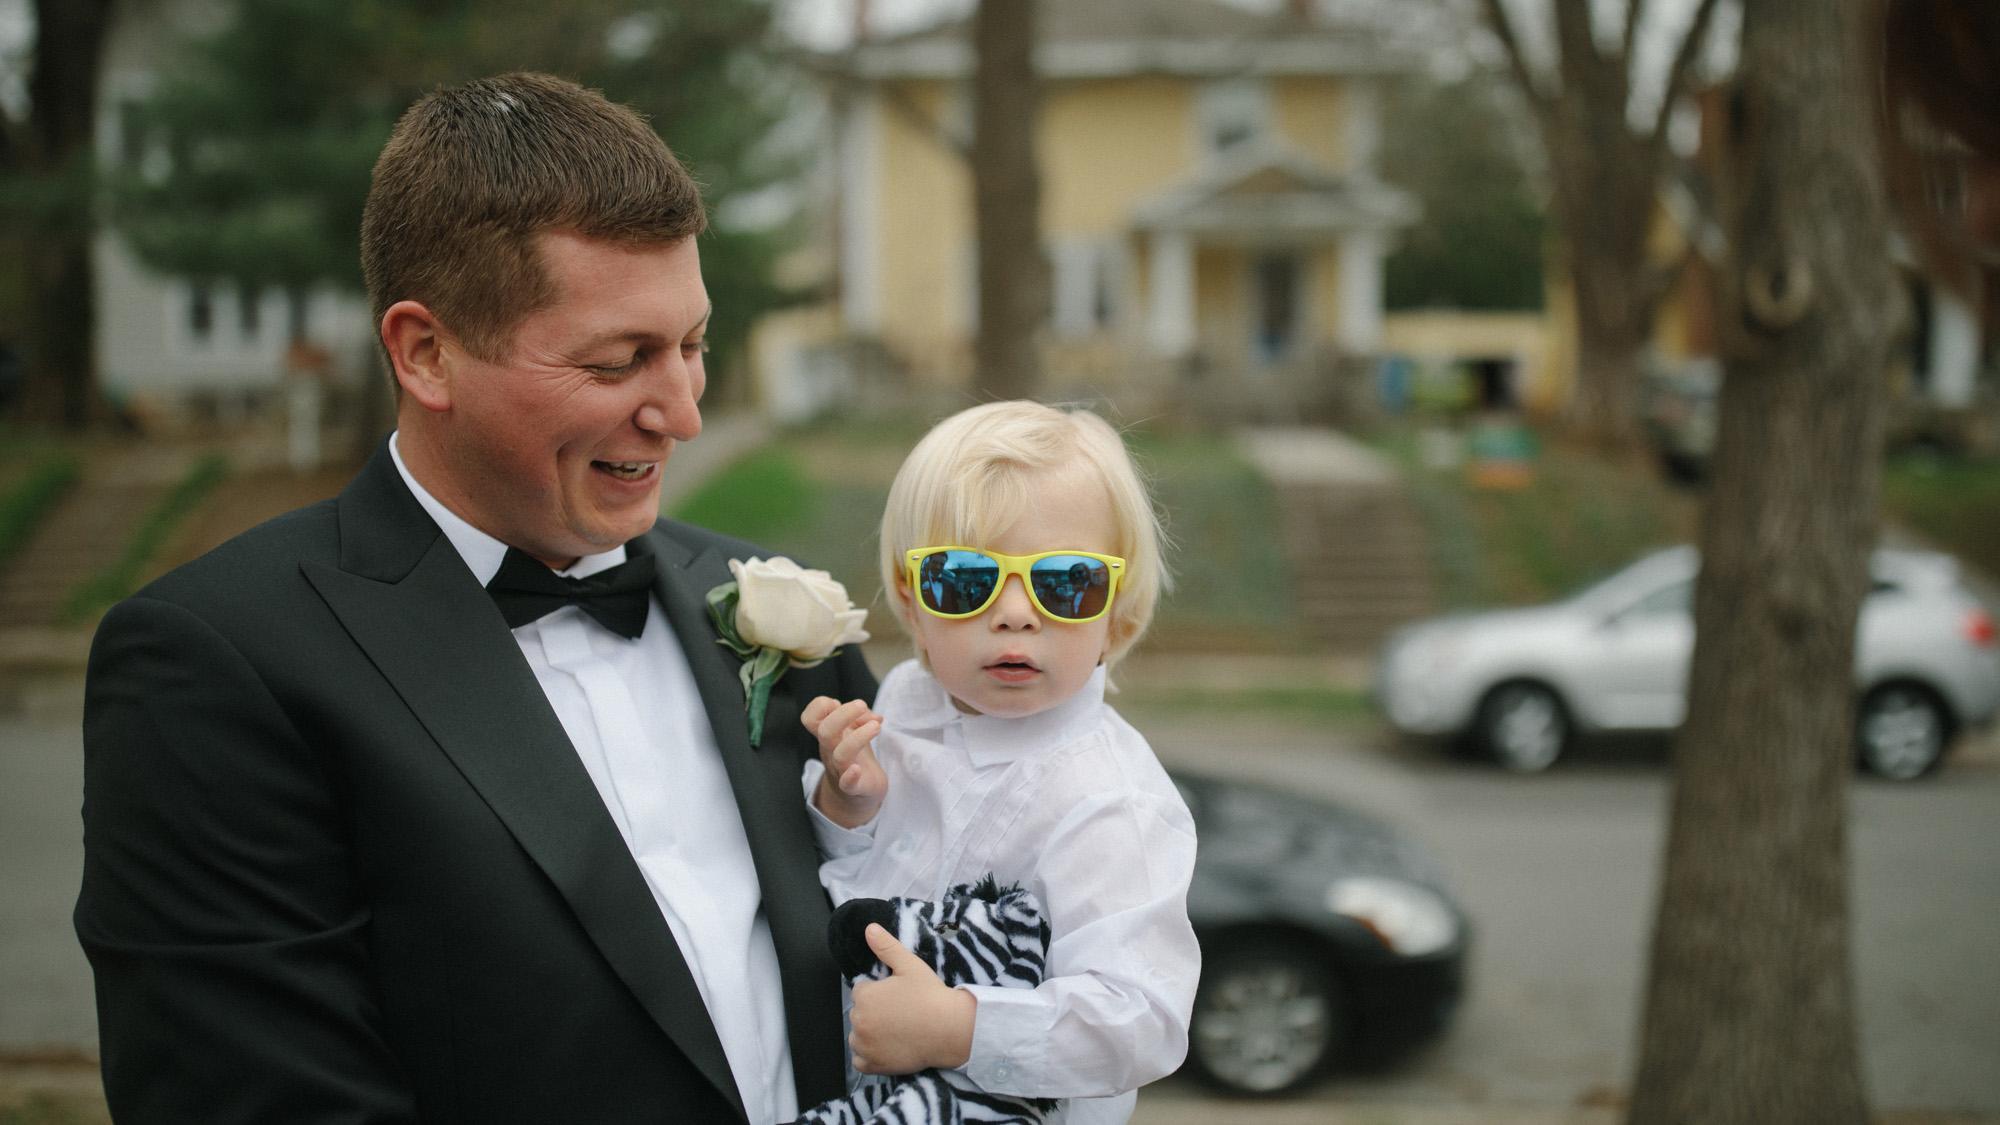 Alec_Vanderboom_kansas_city_hip_wedding_photos-0021.jpg